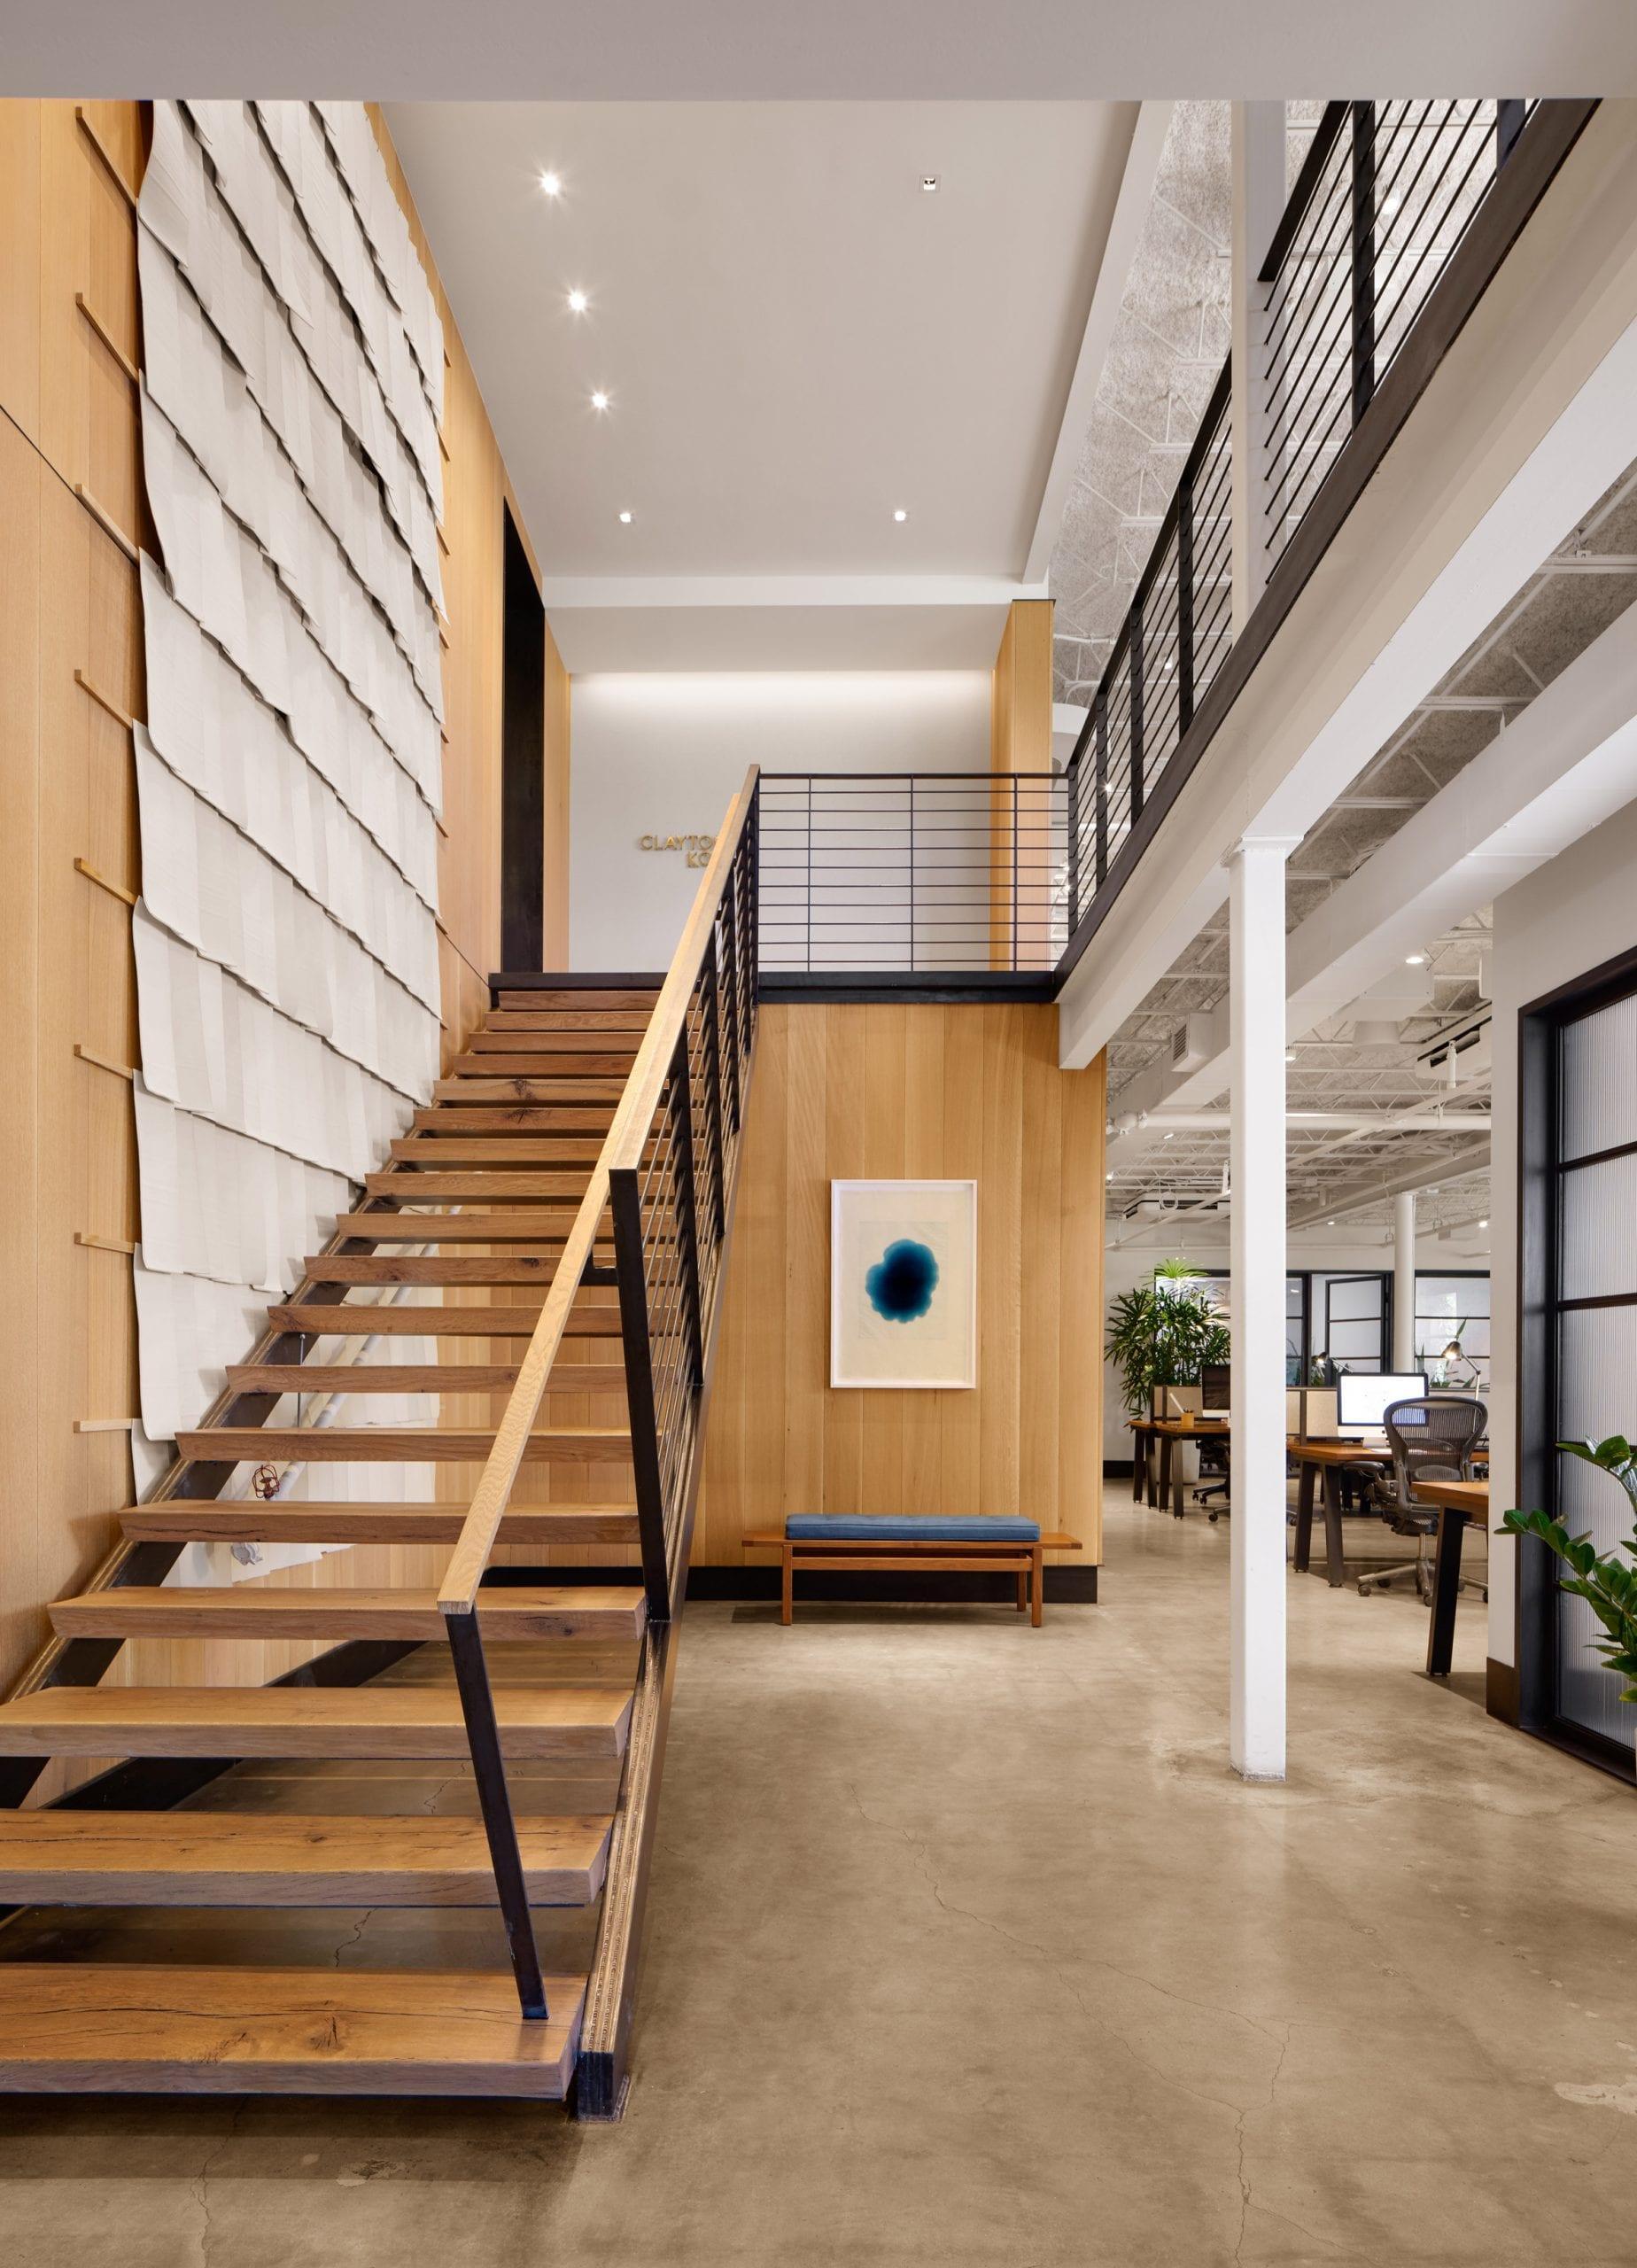 Interior of Design Office in Texas